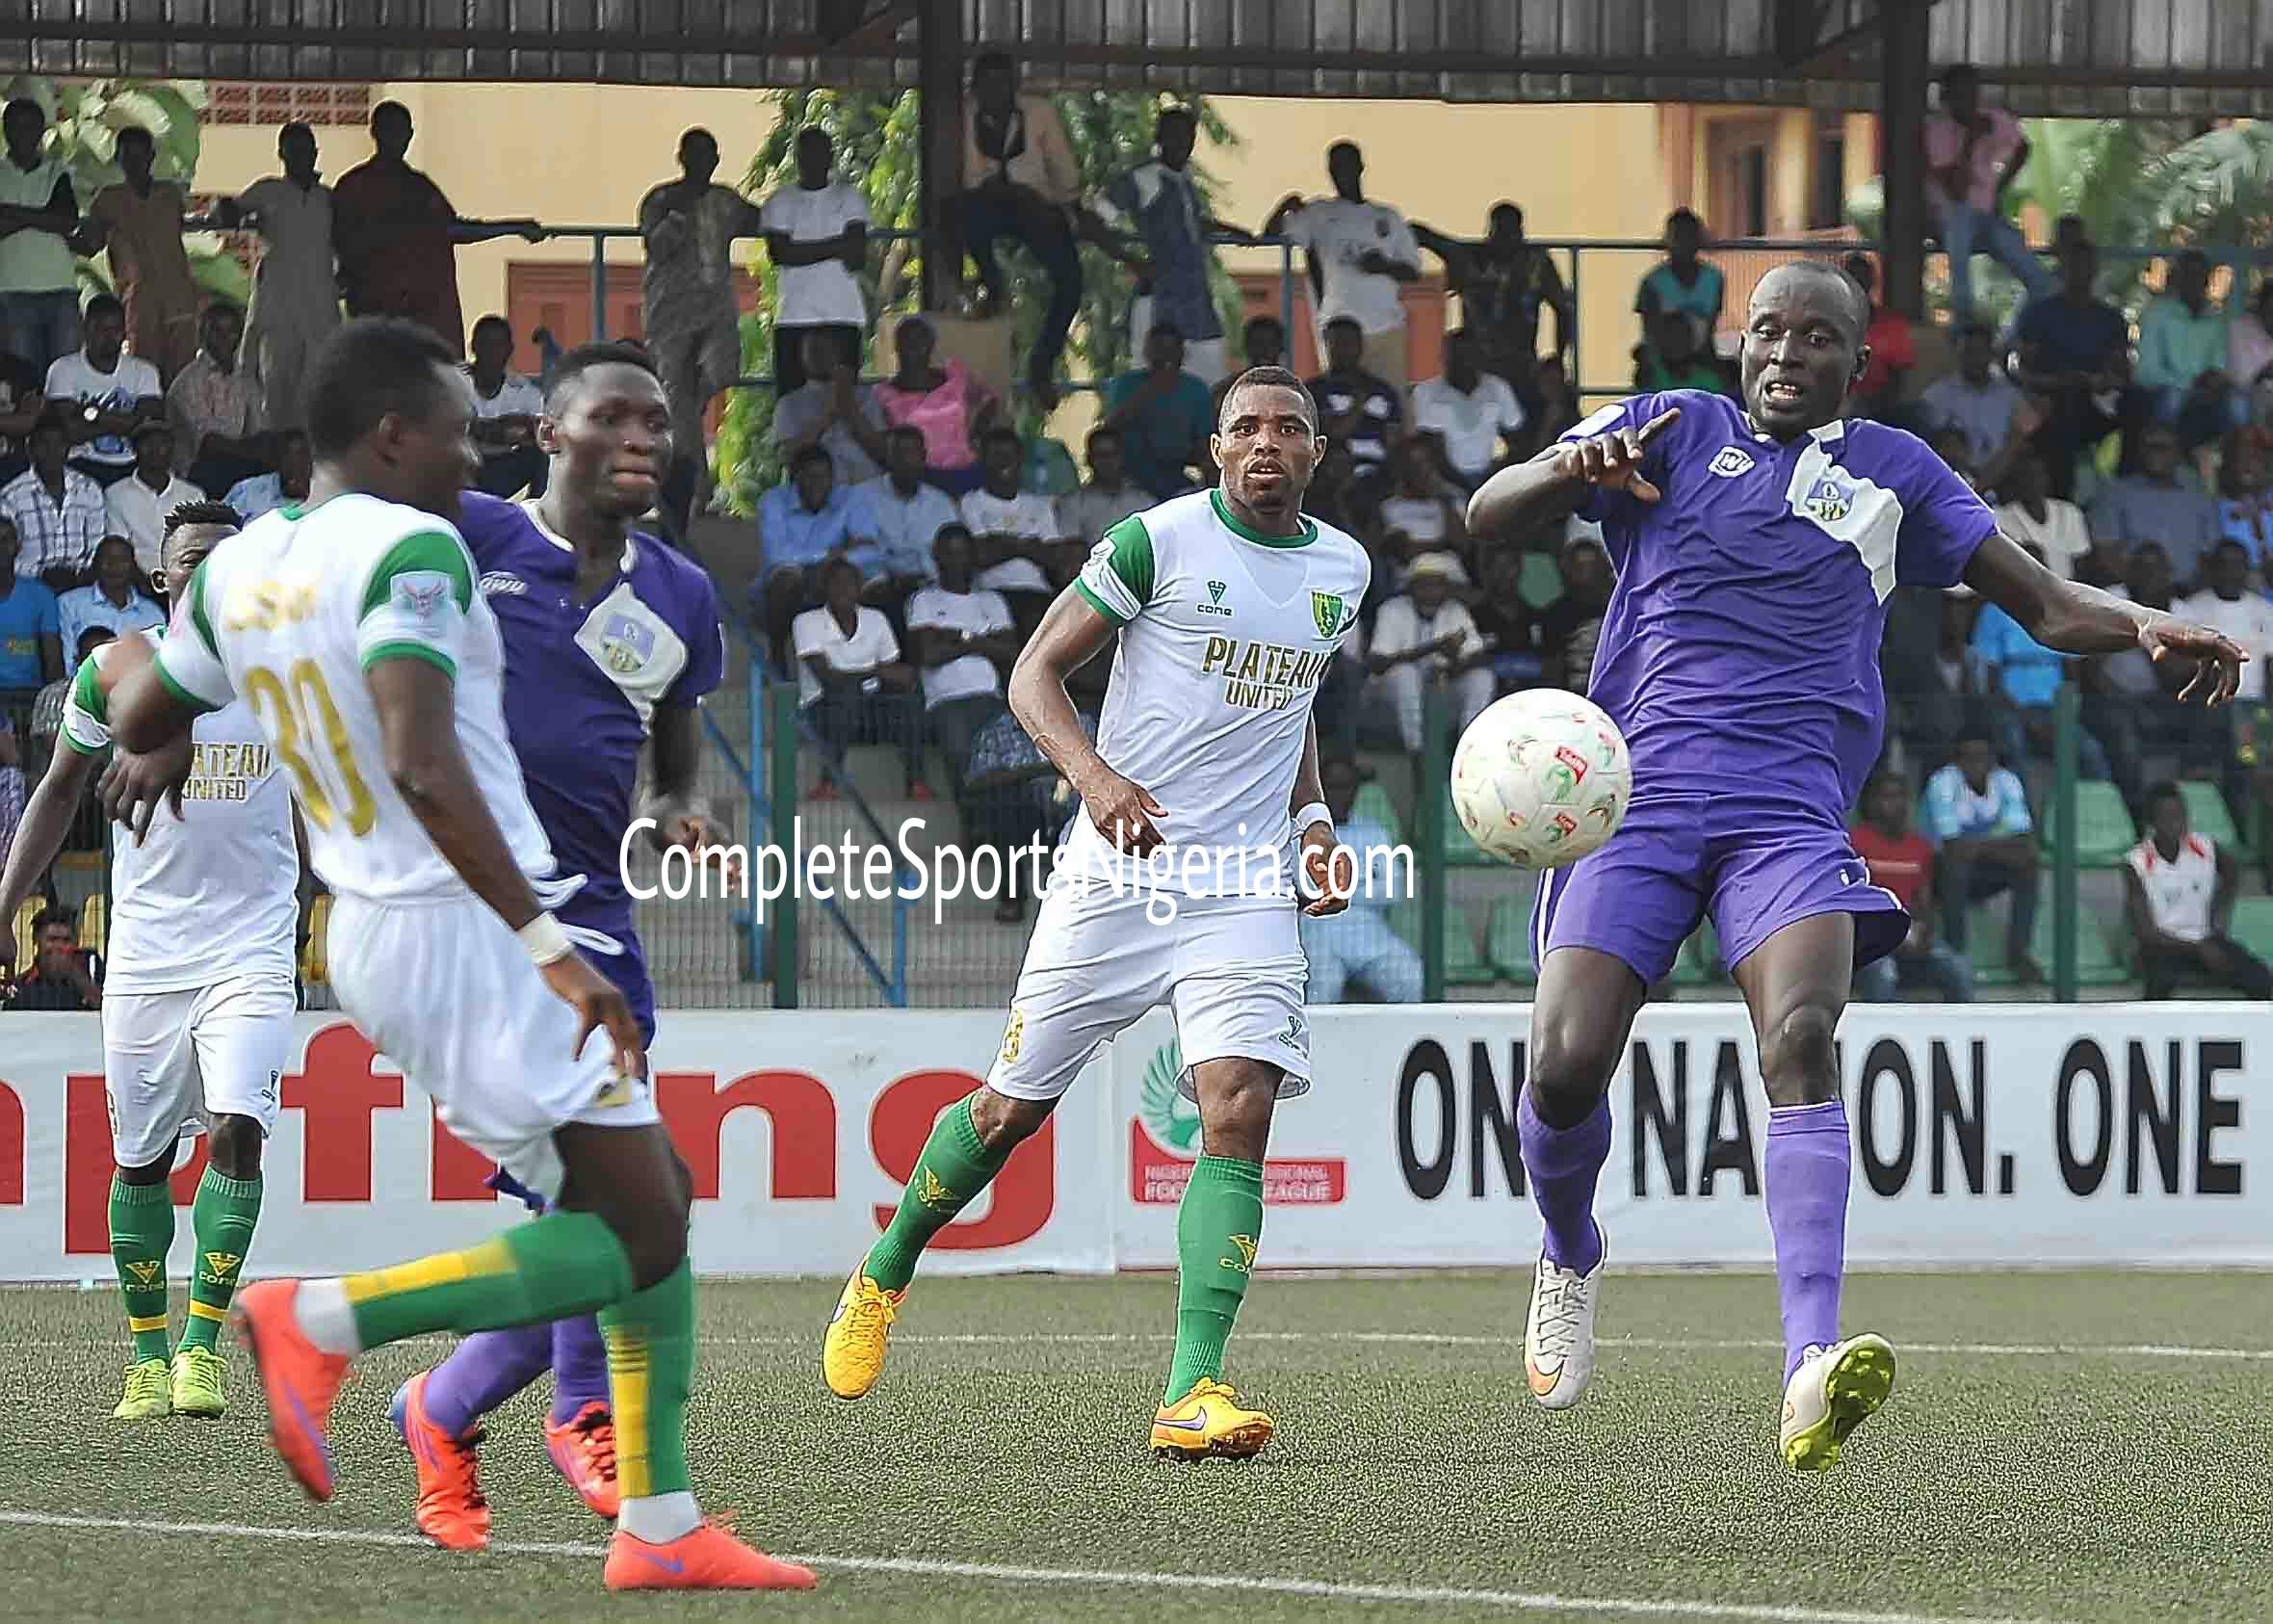 NPFL: Rangers Hold Enyimba, Topple Wikki; 3SC, Plateau Edge Sunshine, MFM